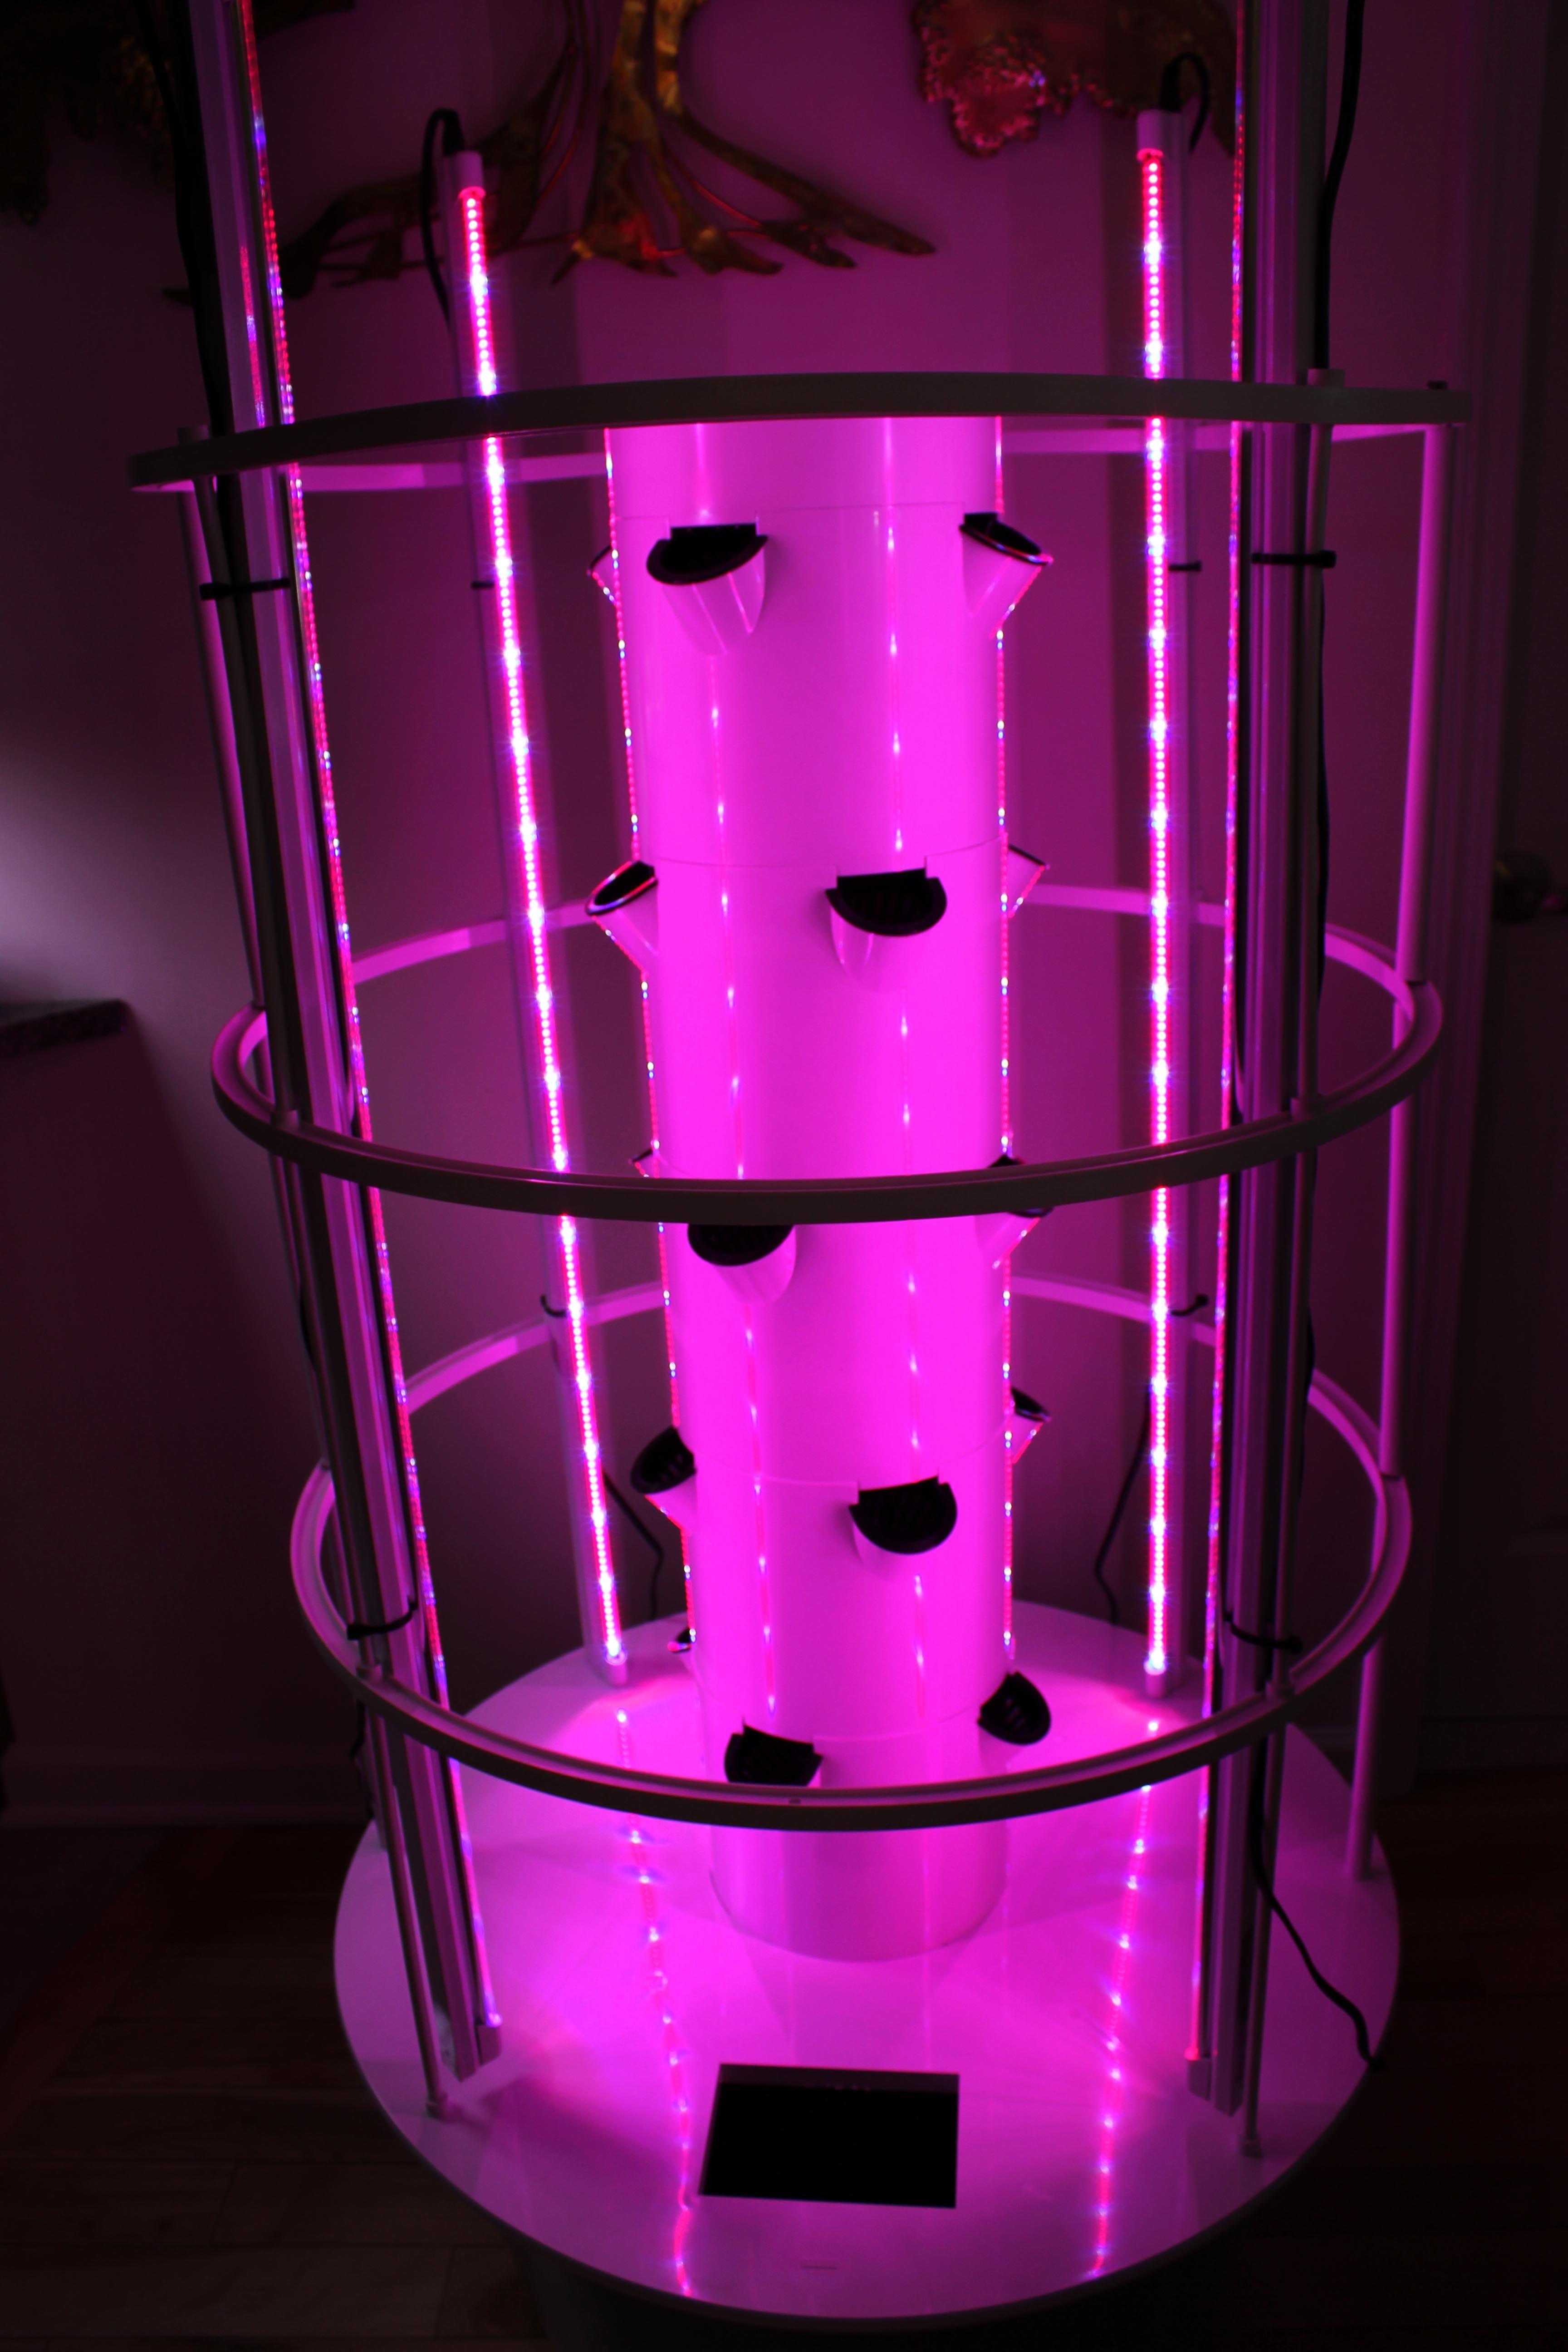 Aeroponic Indoor Tower Garden Setup Using Pink LED Grow